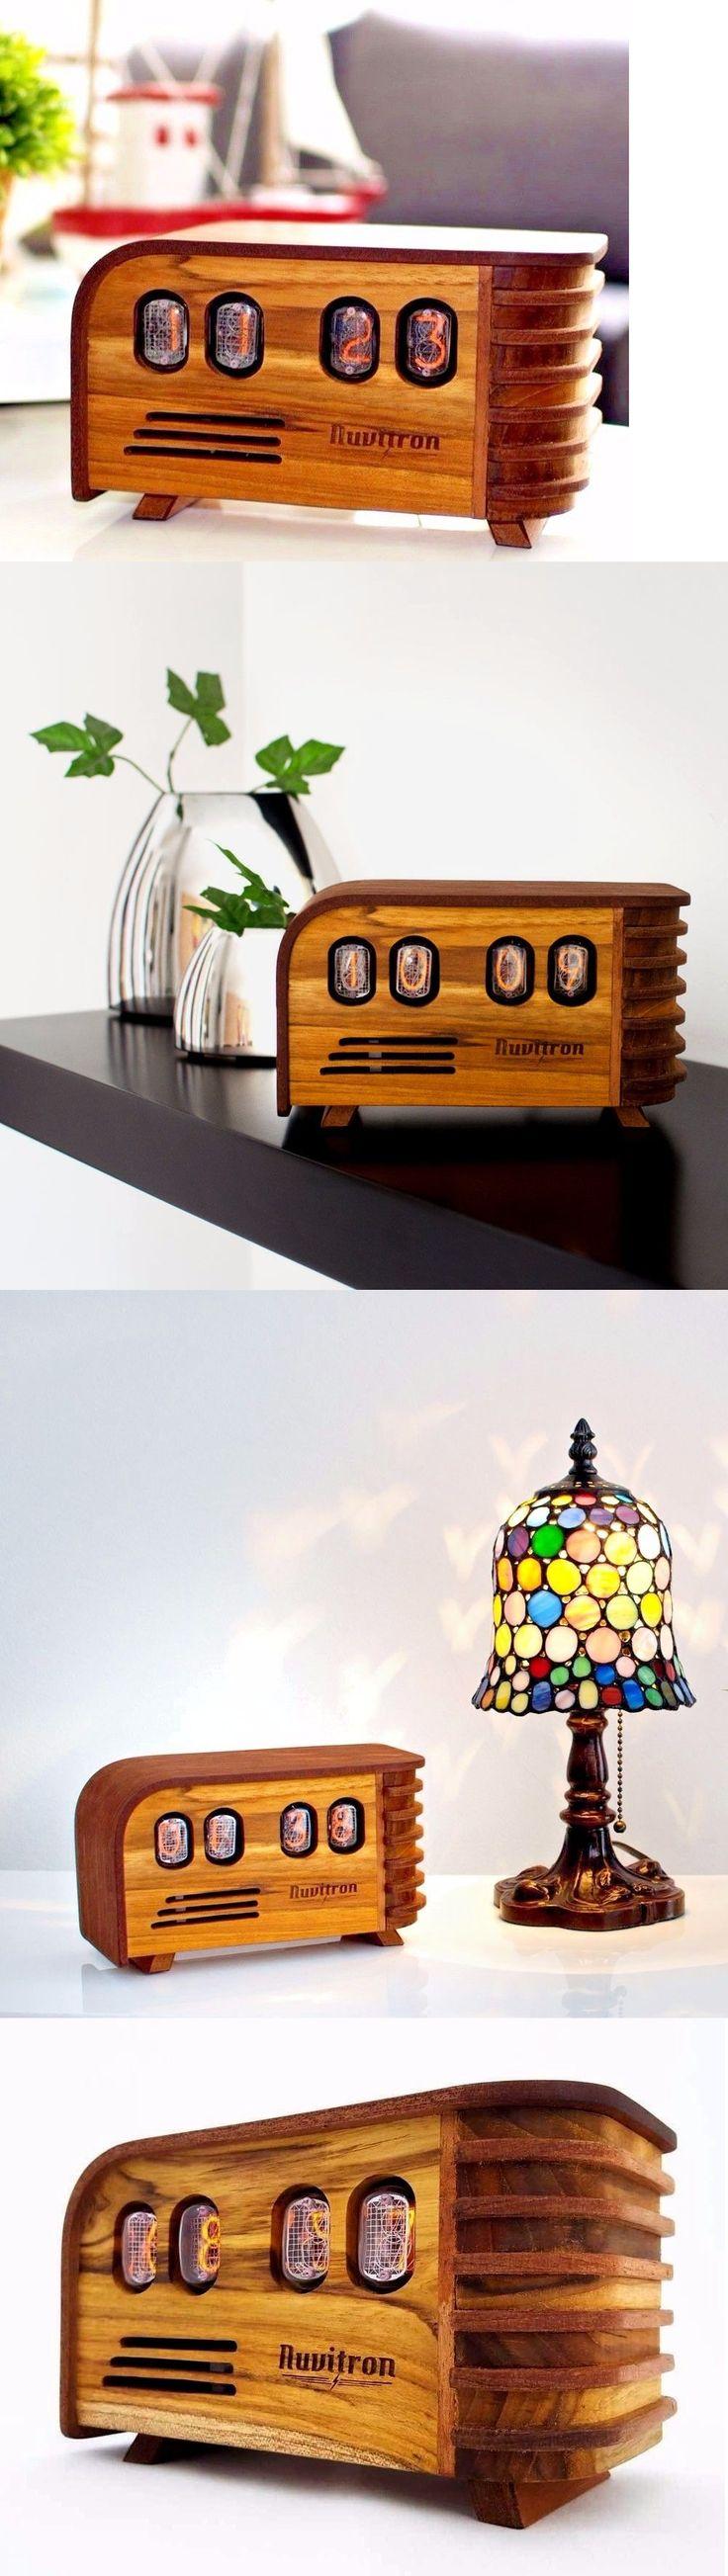 Digital Clocks and Clock Radios: Vintage Nixie Tube Clock Made W Retro In-12 Nixie Tubes - Handmade Nixie Clock -> BUY IT NOW ONLY: $299 on eBay!